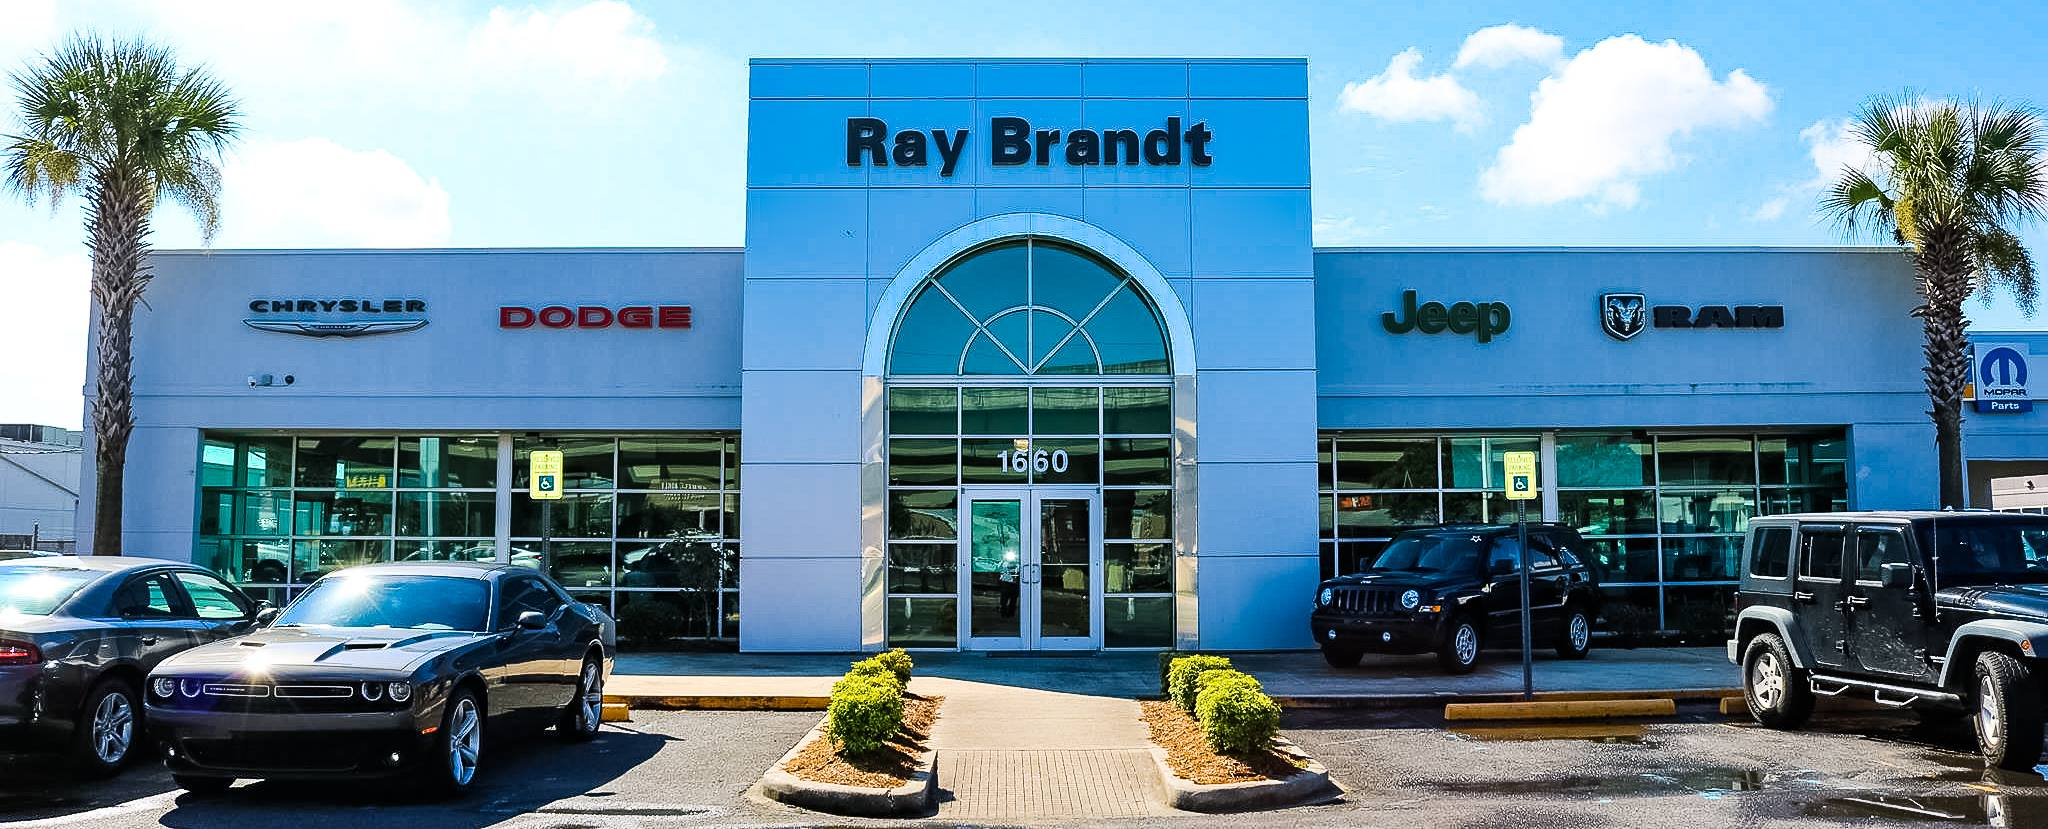 Ray Brandt Dodge >> Ray Brandt Chrysler Dodge Jeep 1660 Westbank Expy Harvey La 70058